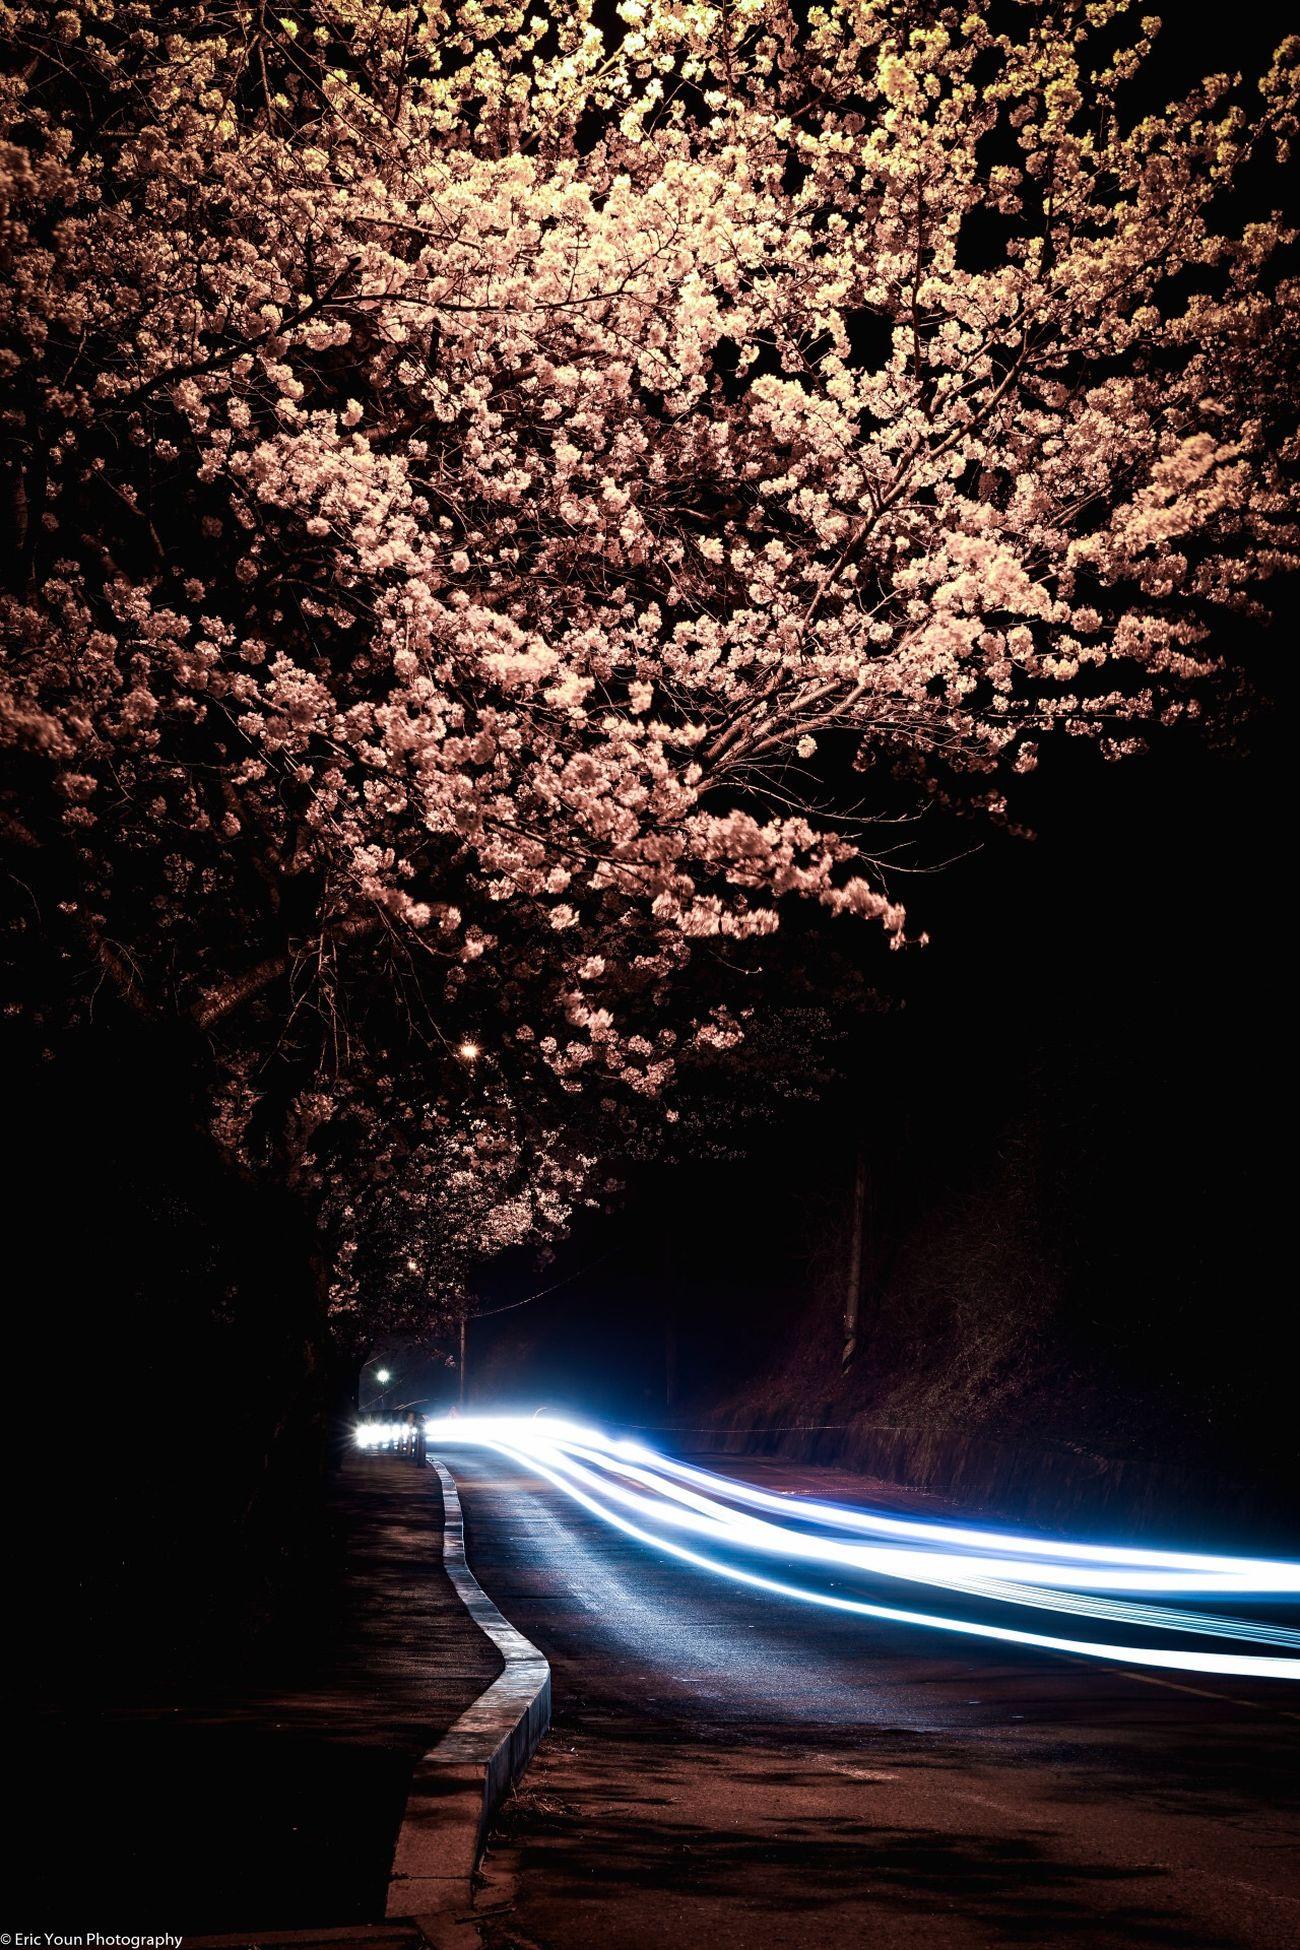 Capturing Movement South Korea EyeEm Best Shots Sonya7II Sonyphotography Nature Photography Flower Collection Nature_collection Naturelovers Long Exposure